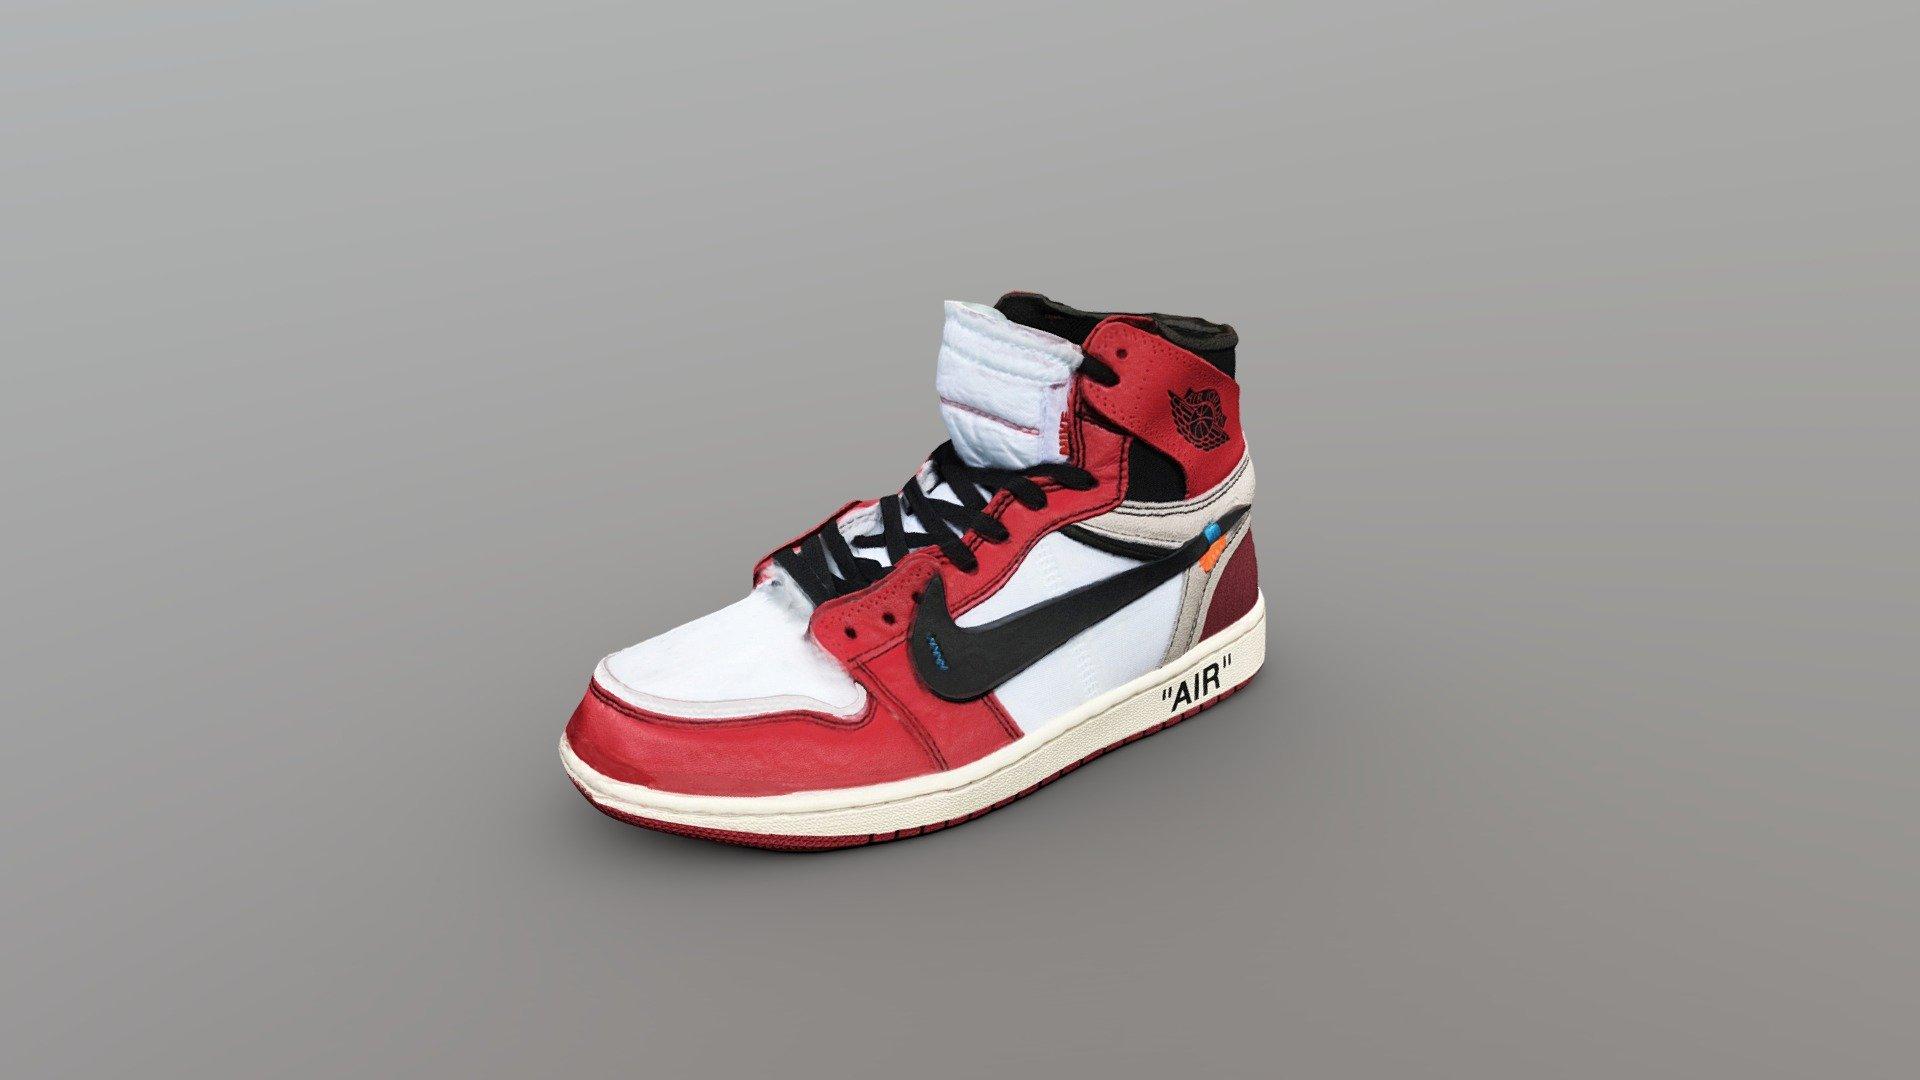 Off-White x Nike Air Jordan 1 Shoe - Buy Royalty Free 3D model by ...